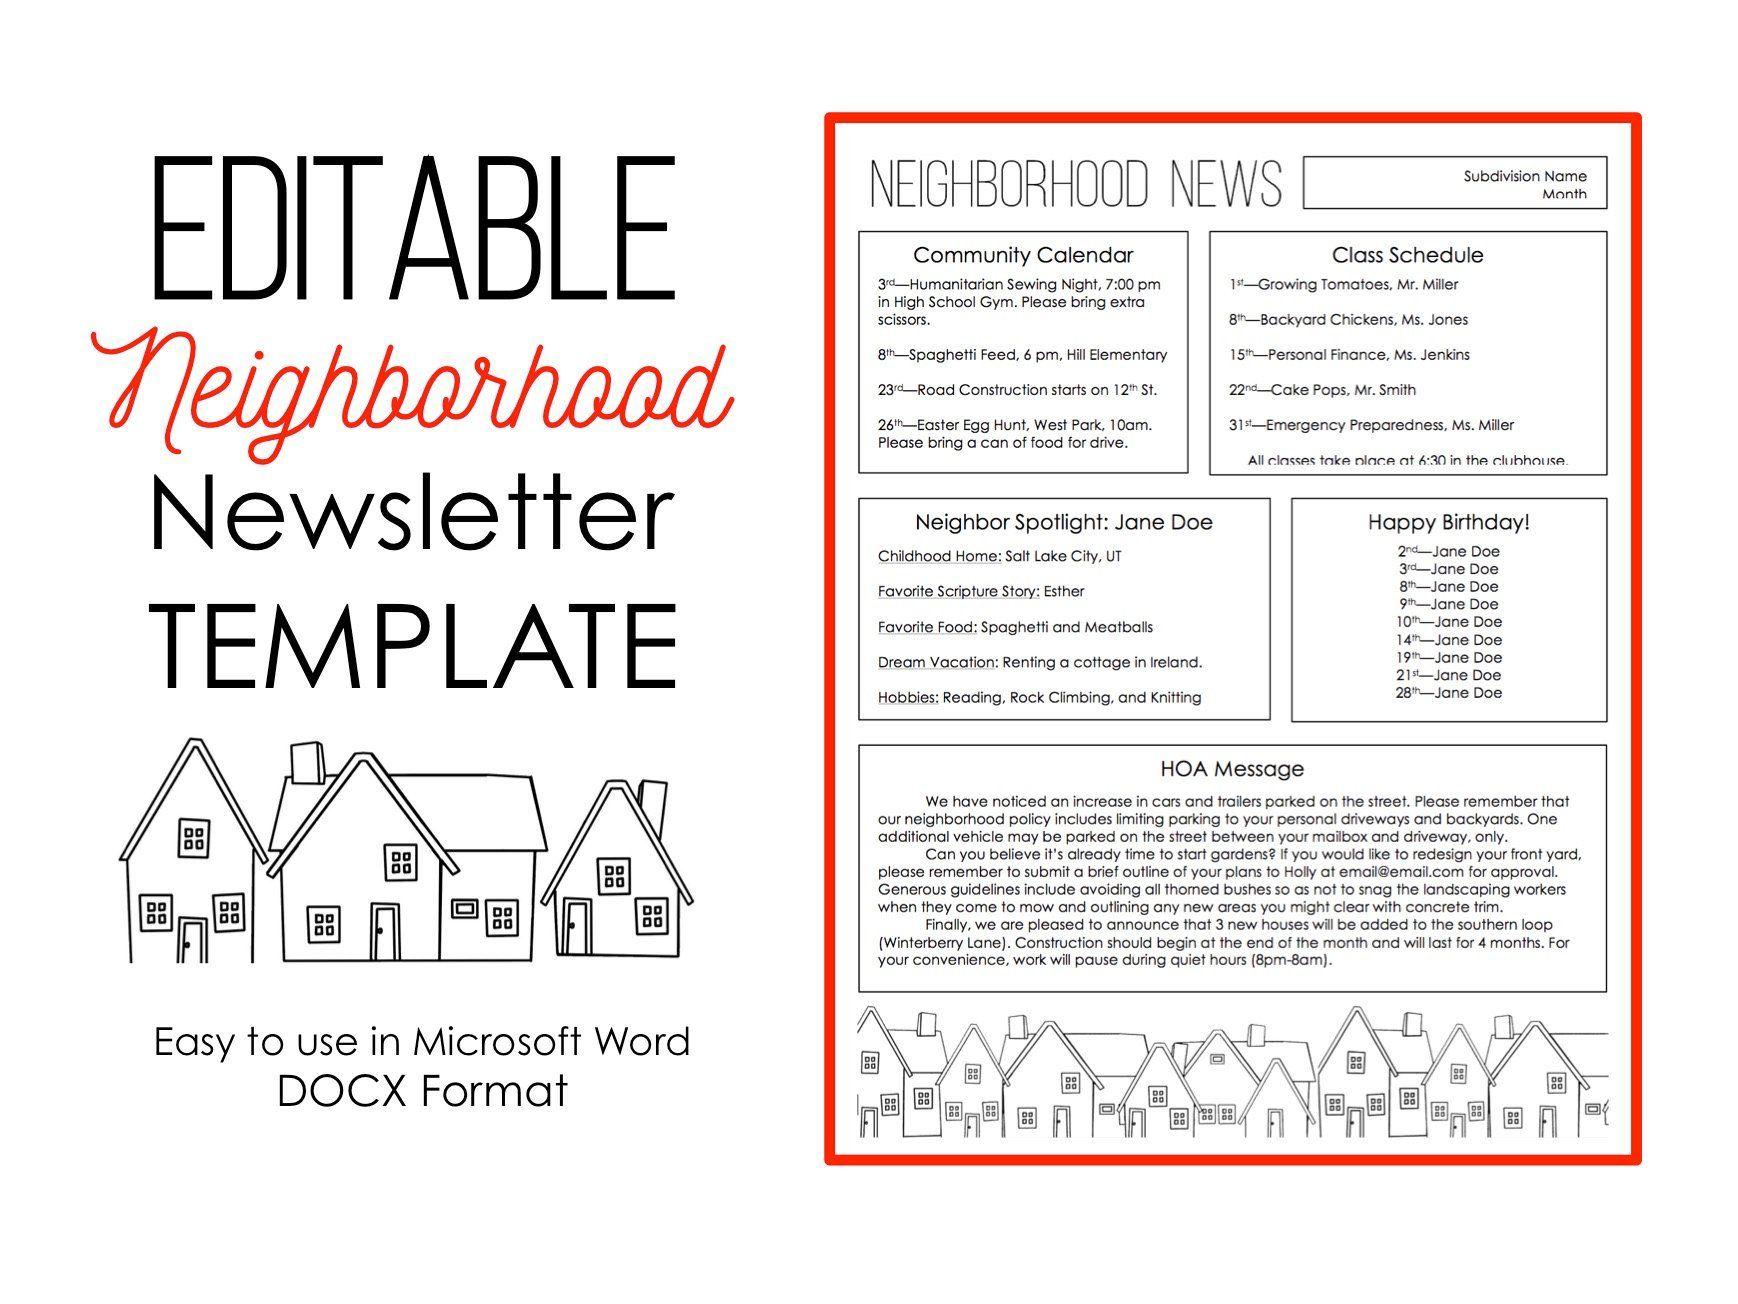 Newsletter Template For Microsoft Word Neighborhood